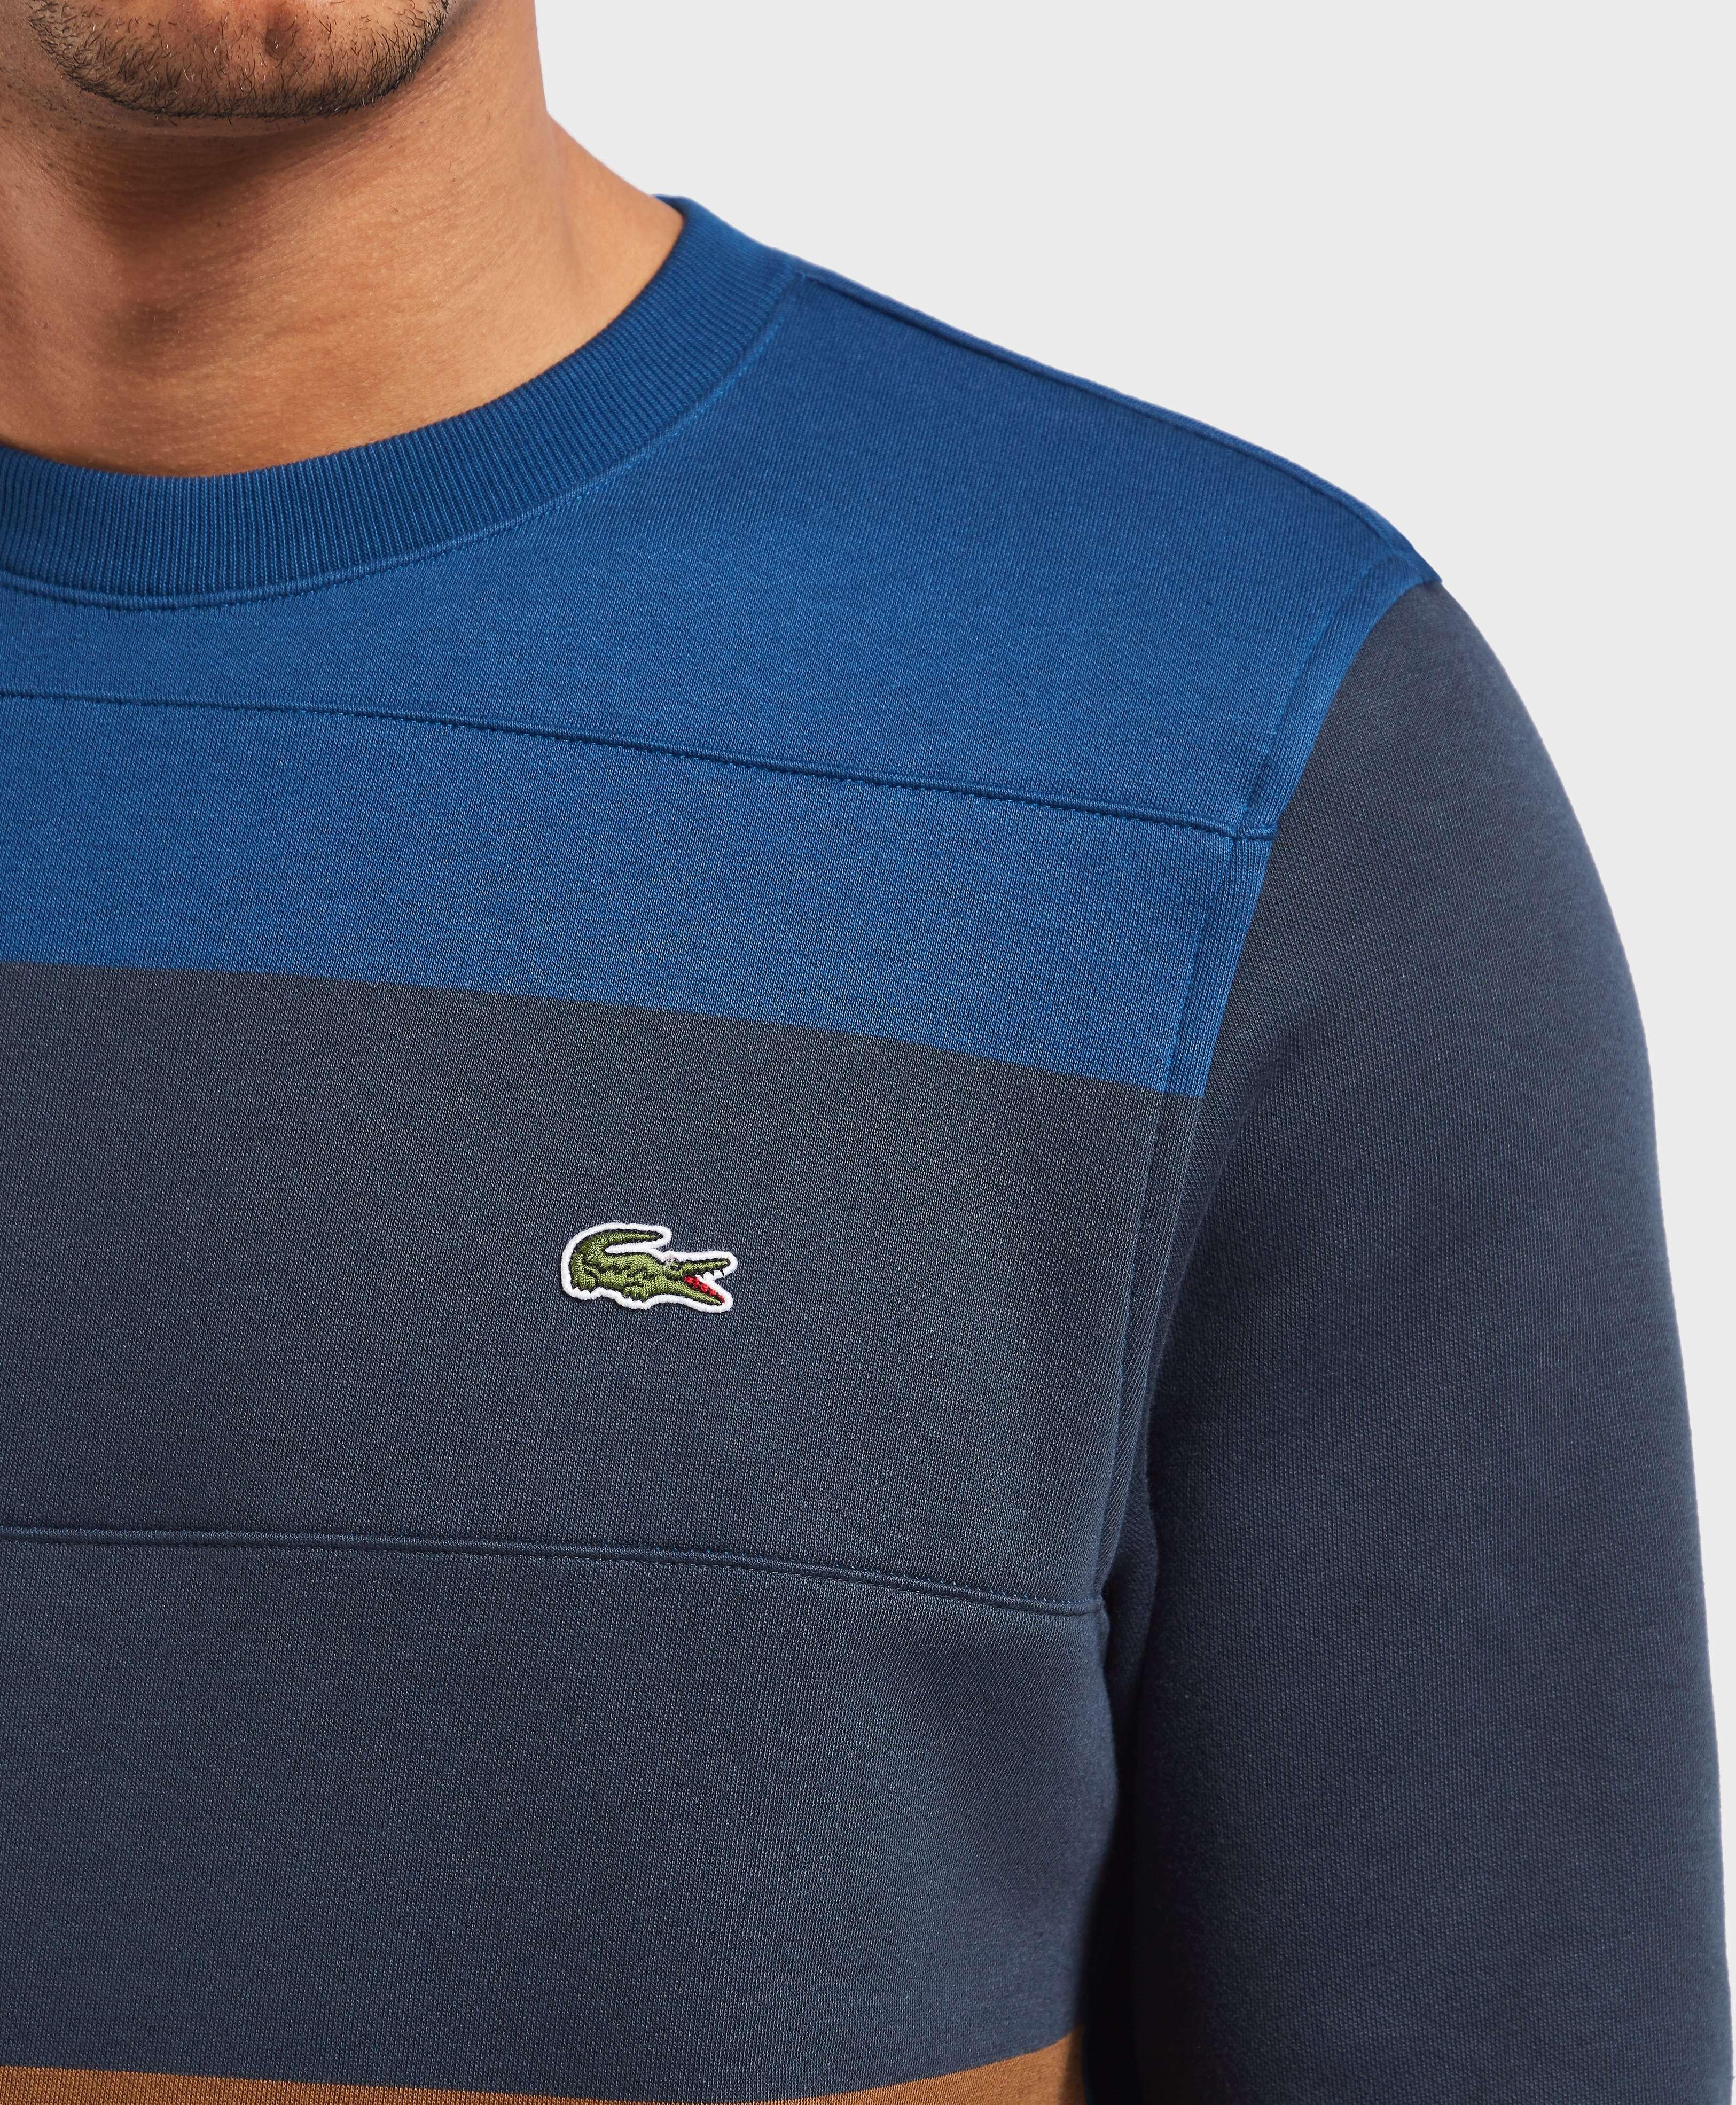 Lacoste Block Stripe Crew Sweatshirt